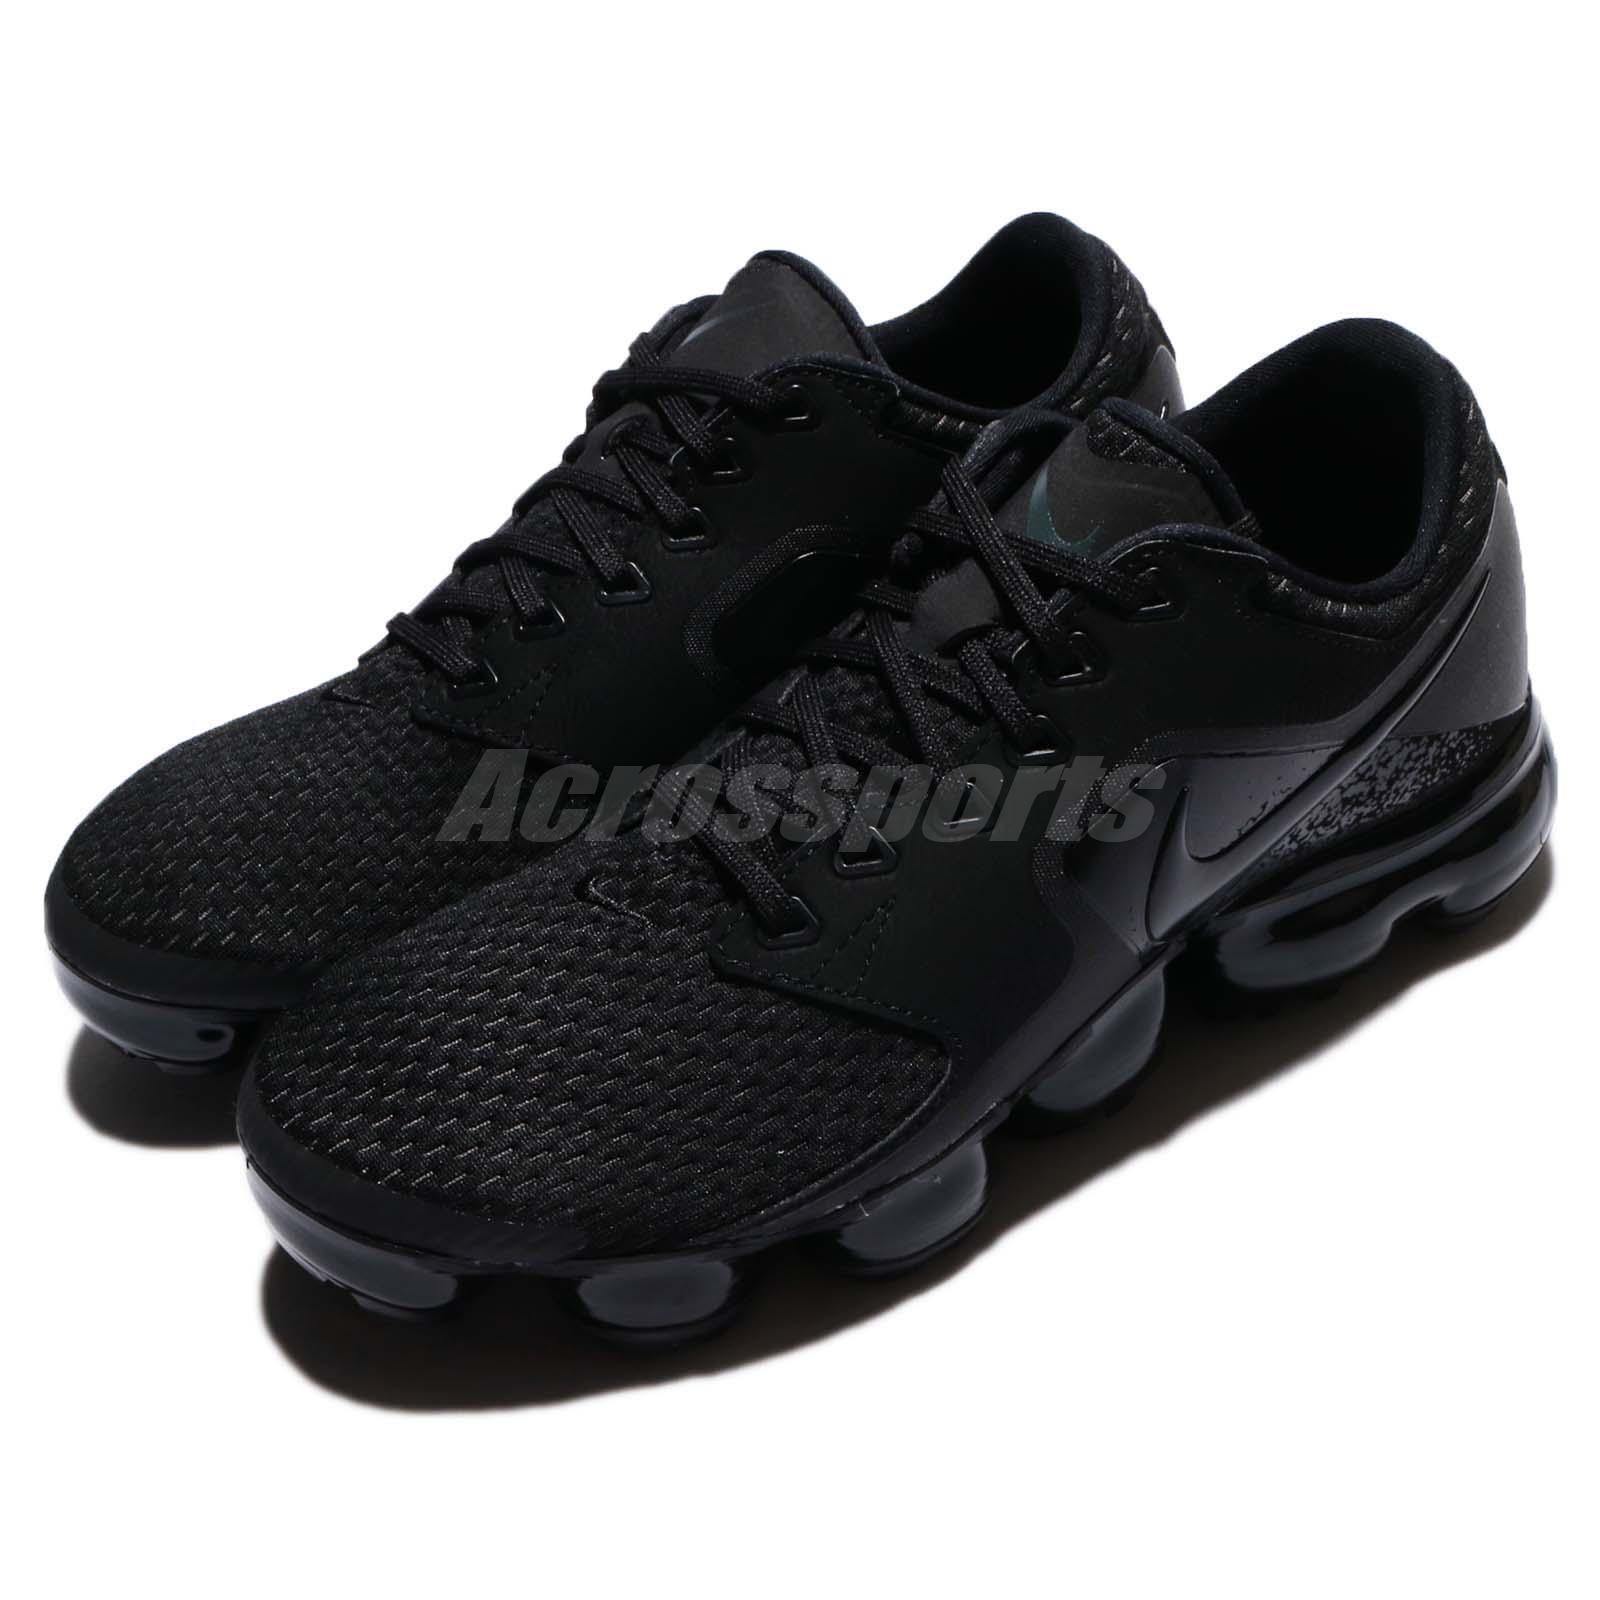 online store 53175 44472 ... WMNS Nike Air vapormax Malla Triple Triple Triple Negro Mujer running  Shoes Sneakers ah9045-002